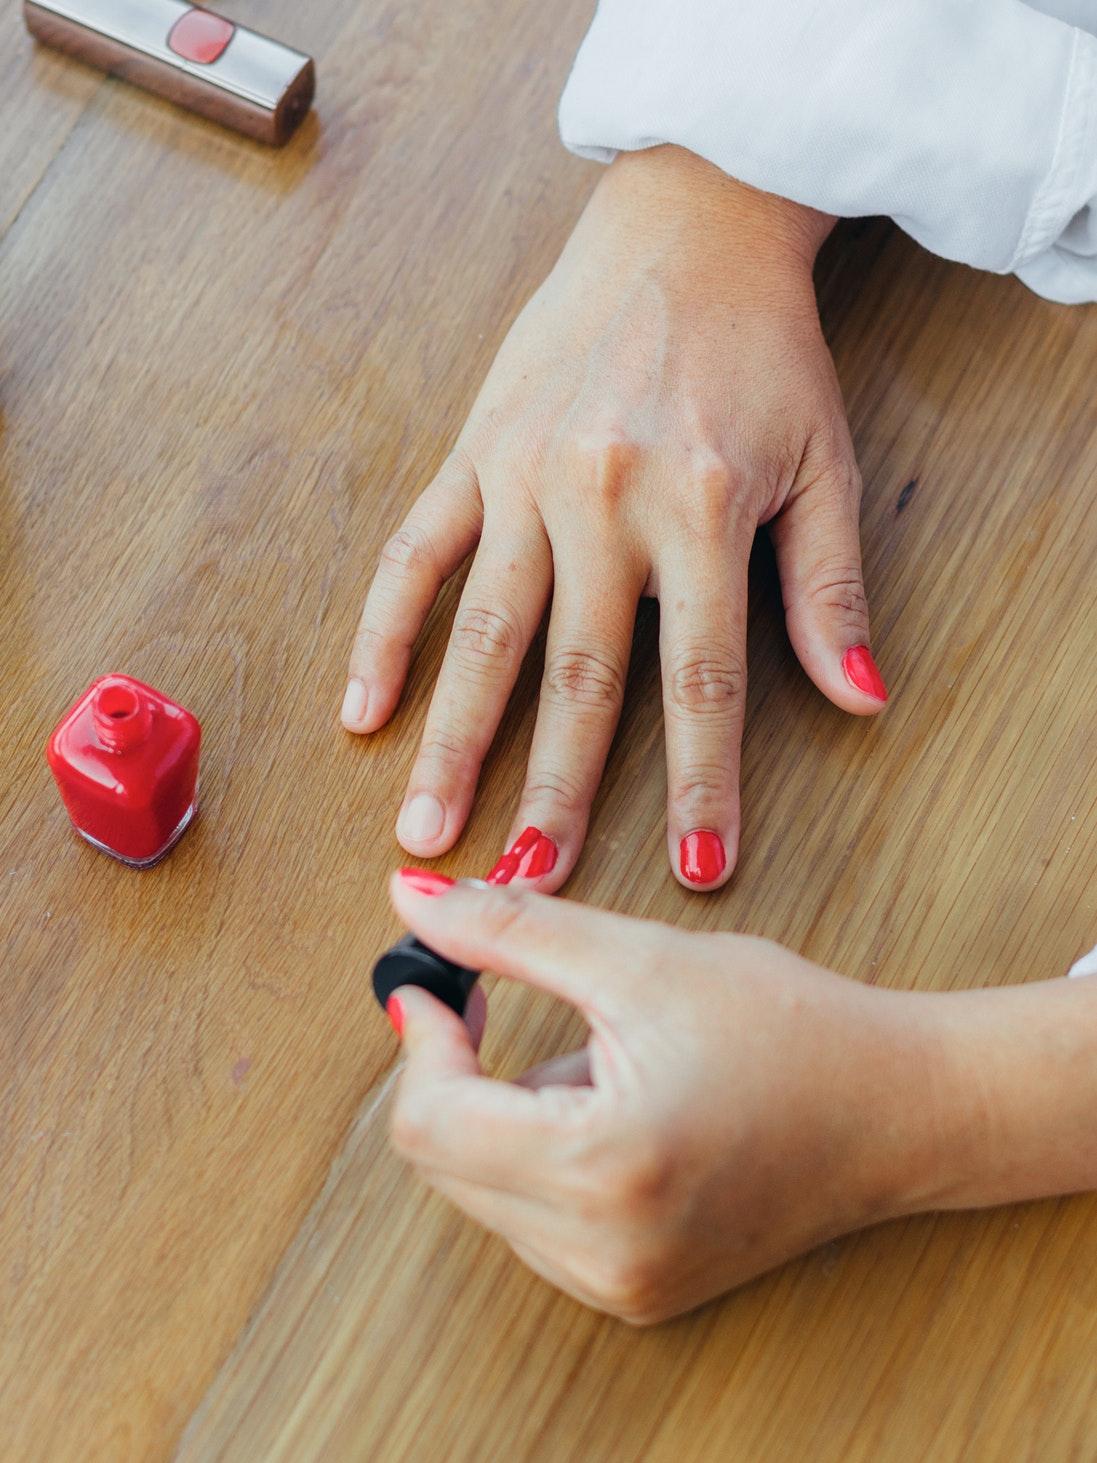 have healthy nails at home